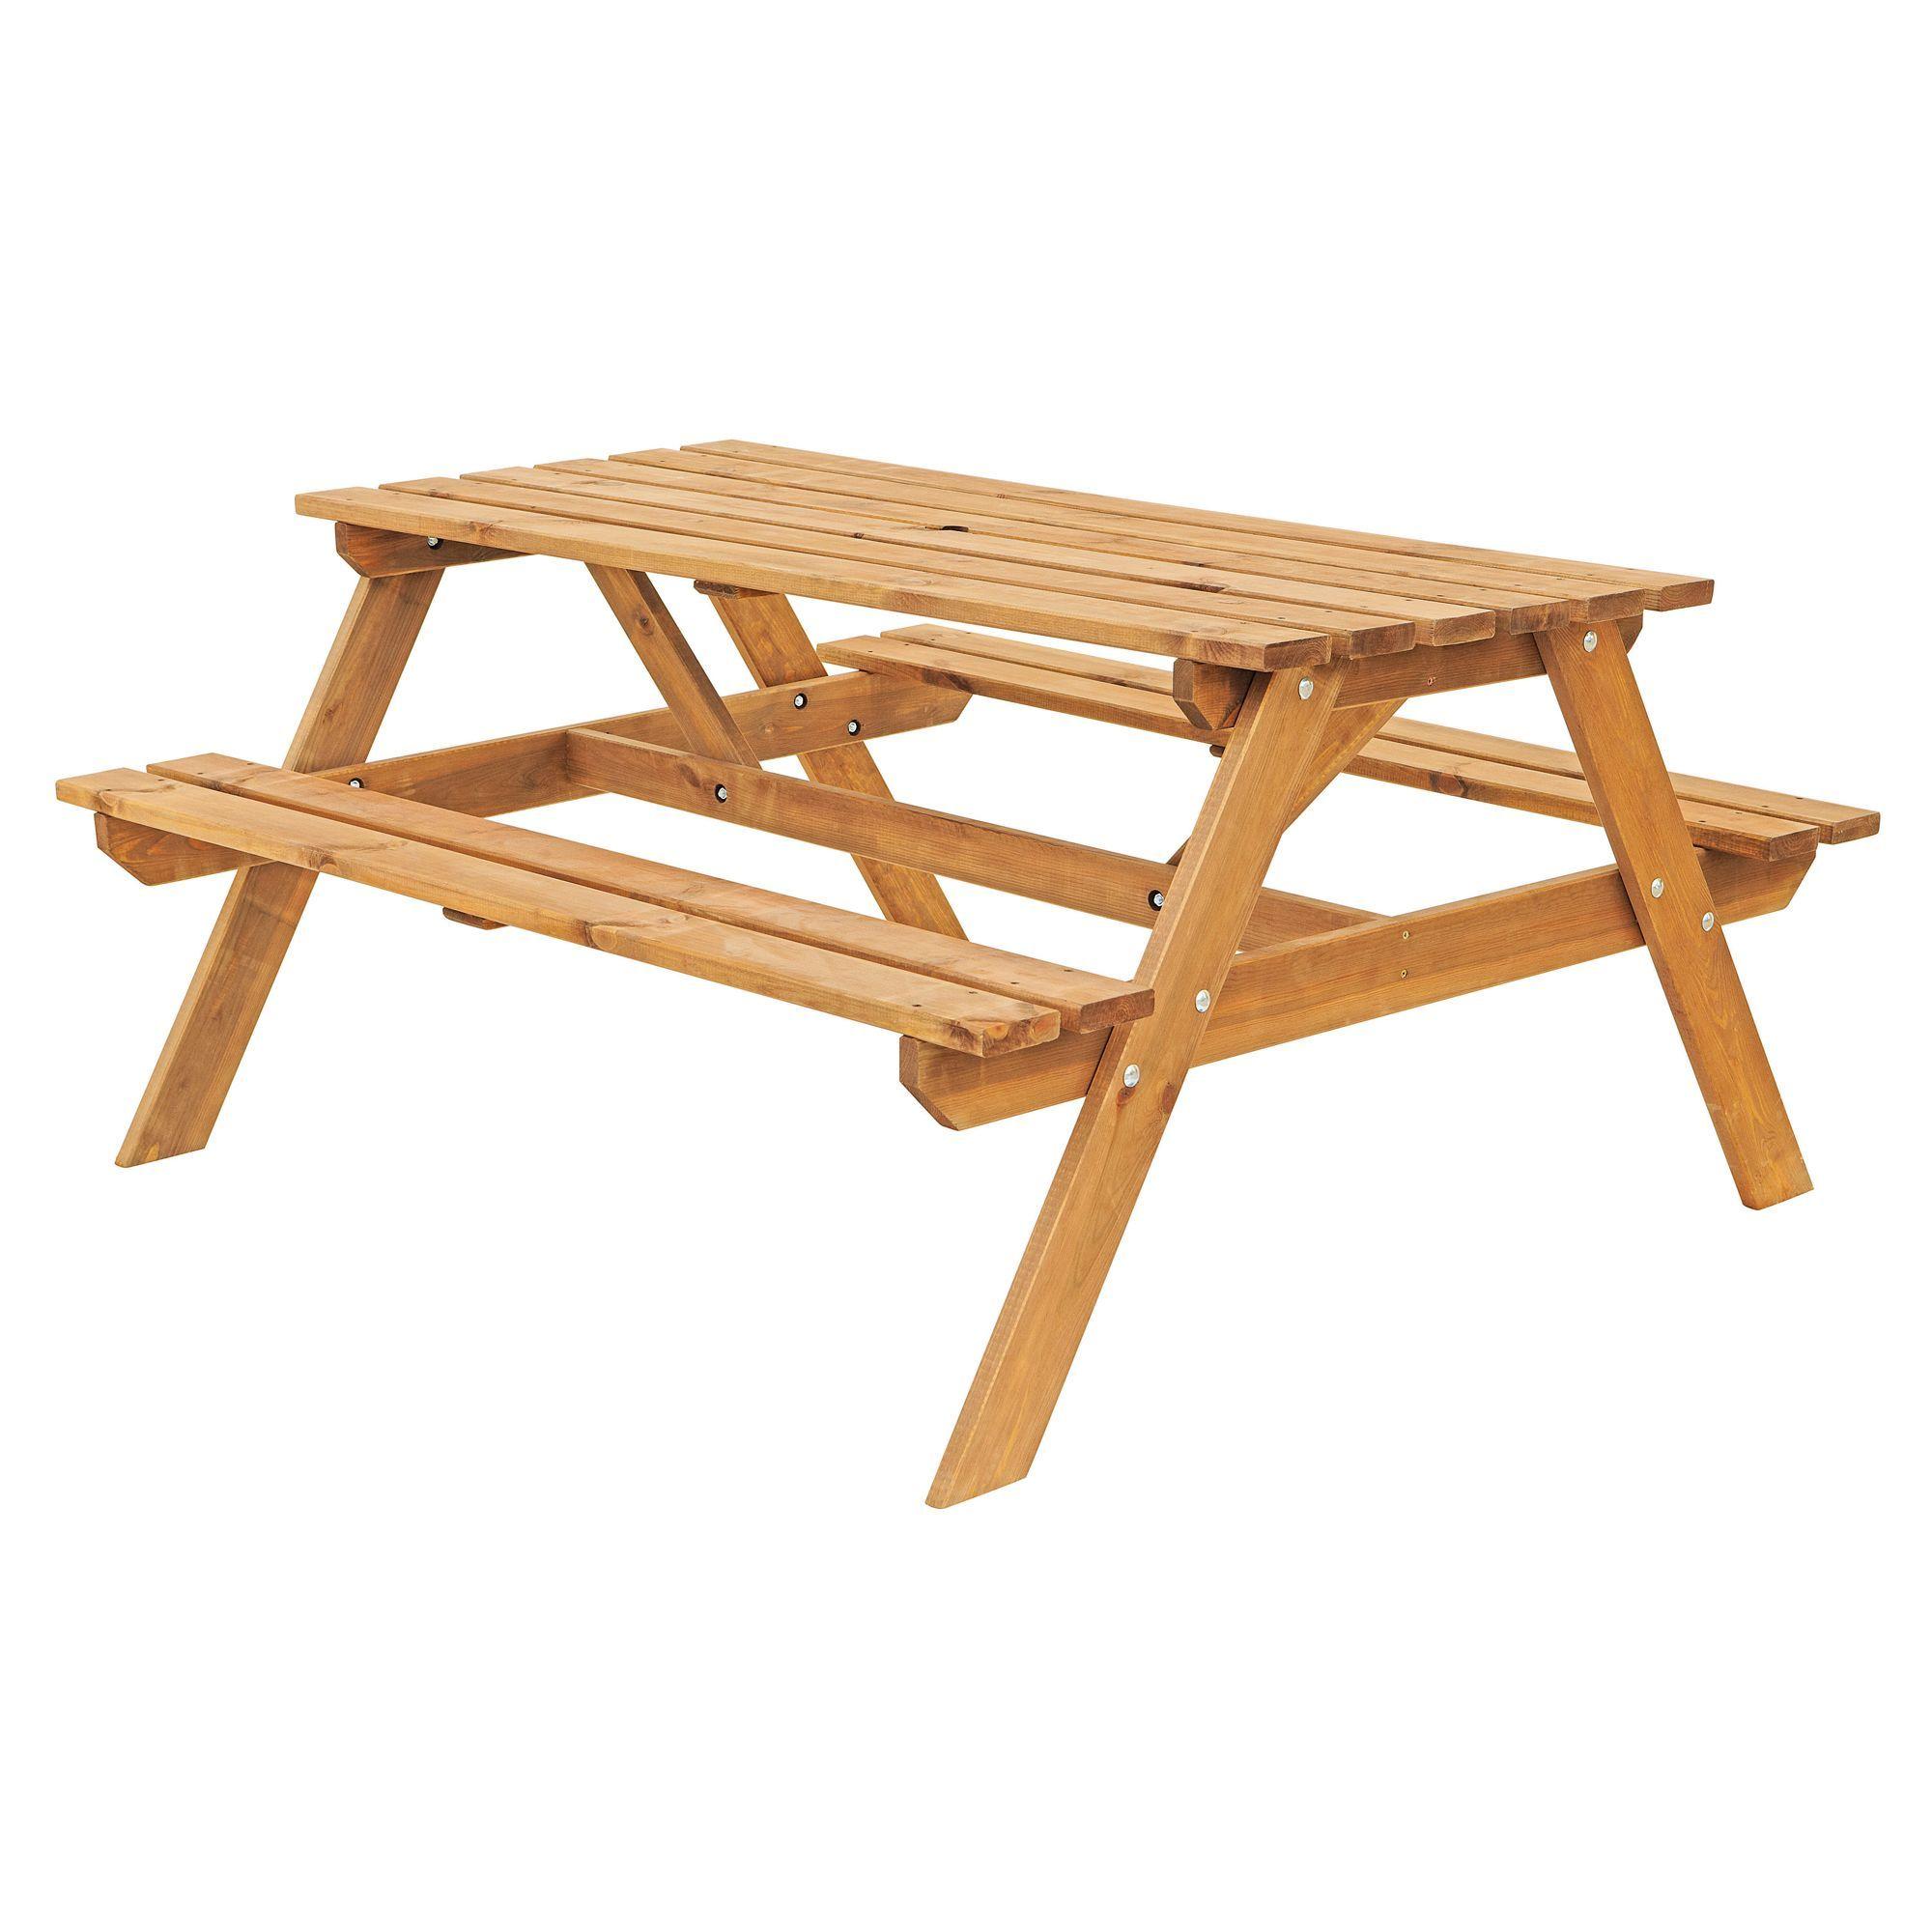 Batam Timber Picnic bench | Garden Dreams | Pinterest | Batam, Bench ...